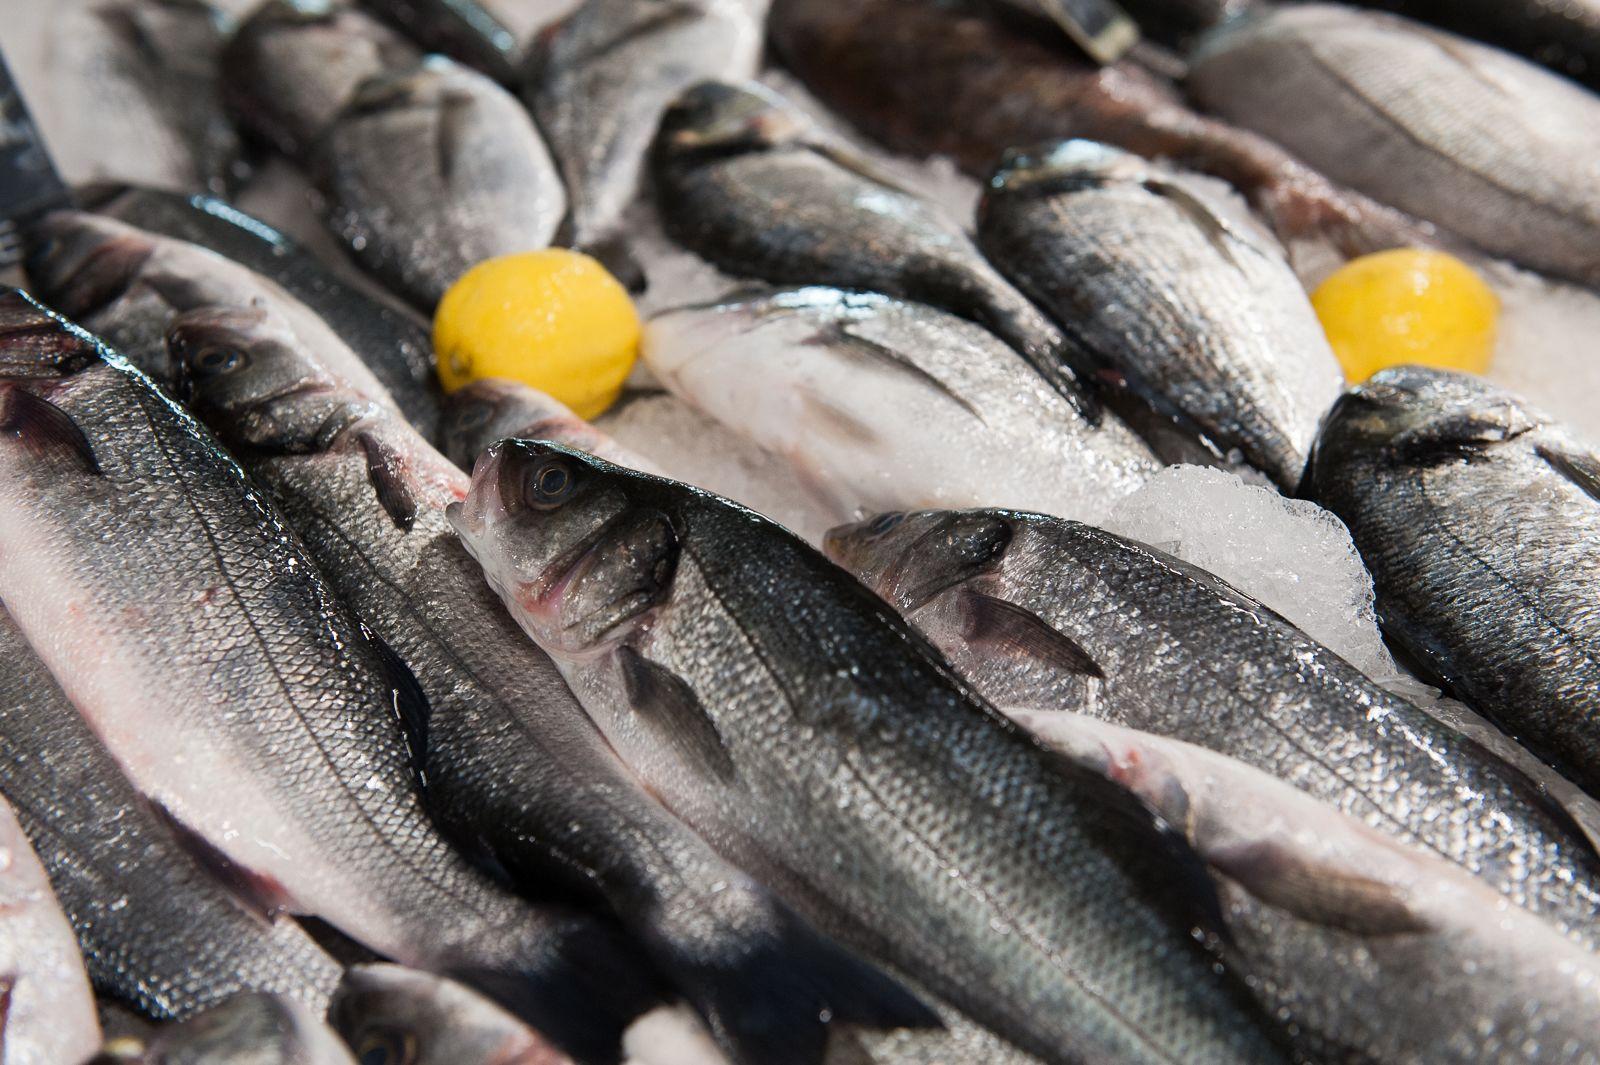 les halles de bacalan piac bordeauy utazás